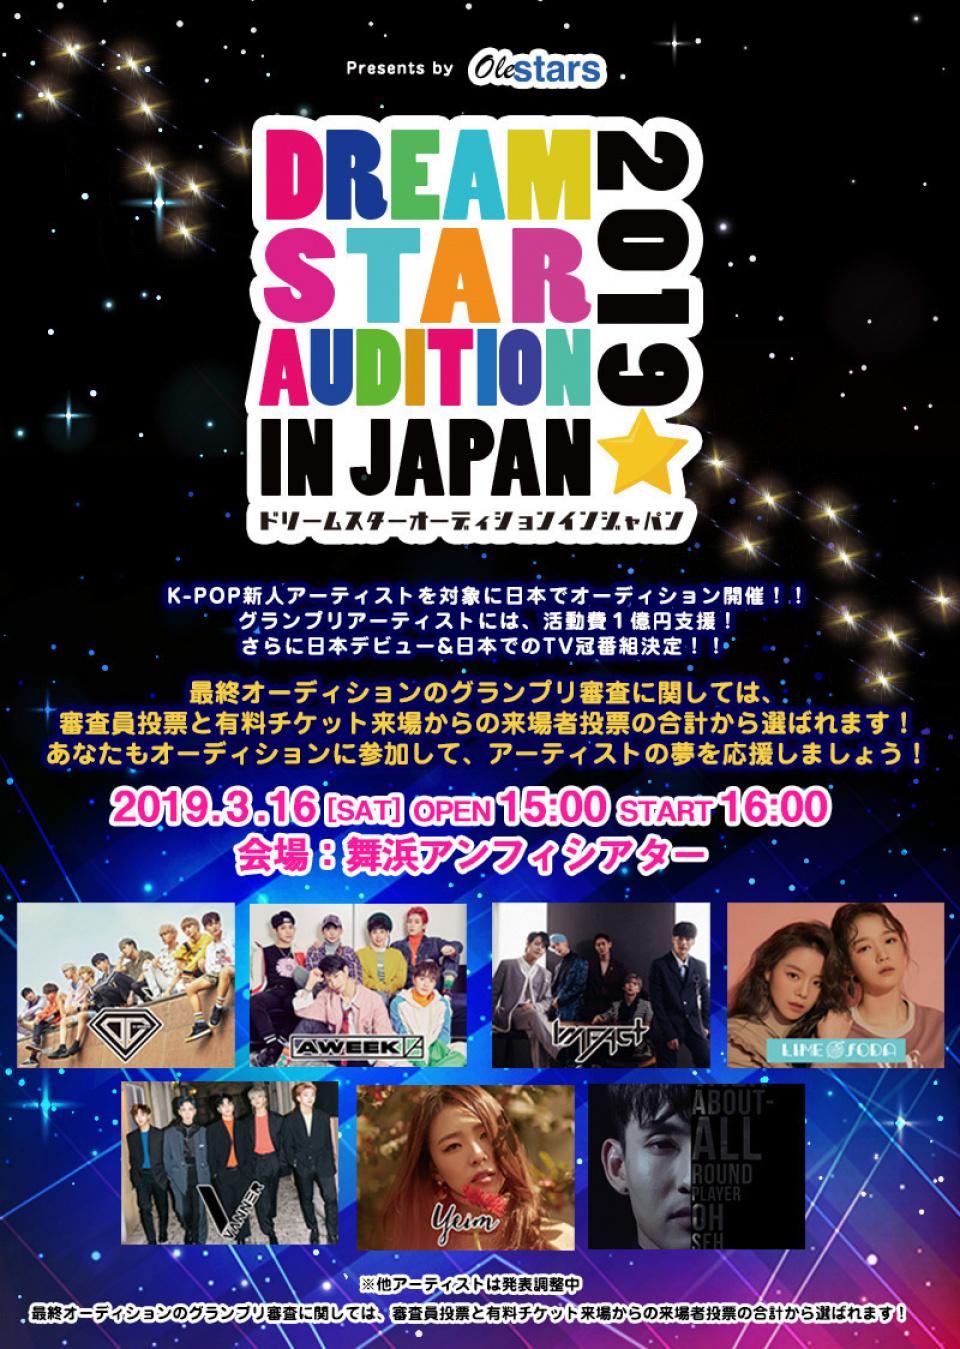 1億円獲得!K-POP DREAM STAR AUDITION 開催決定